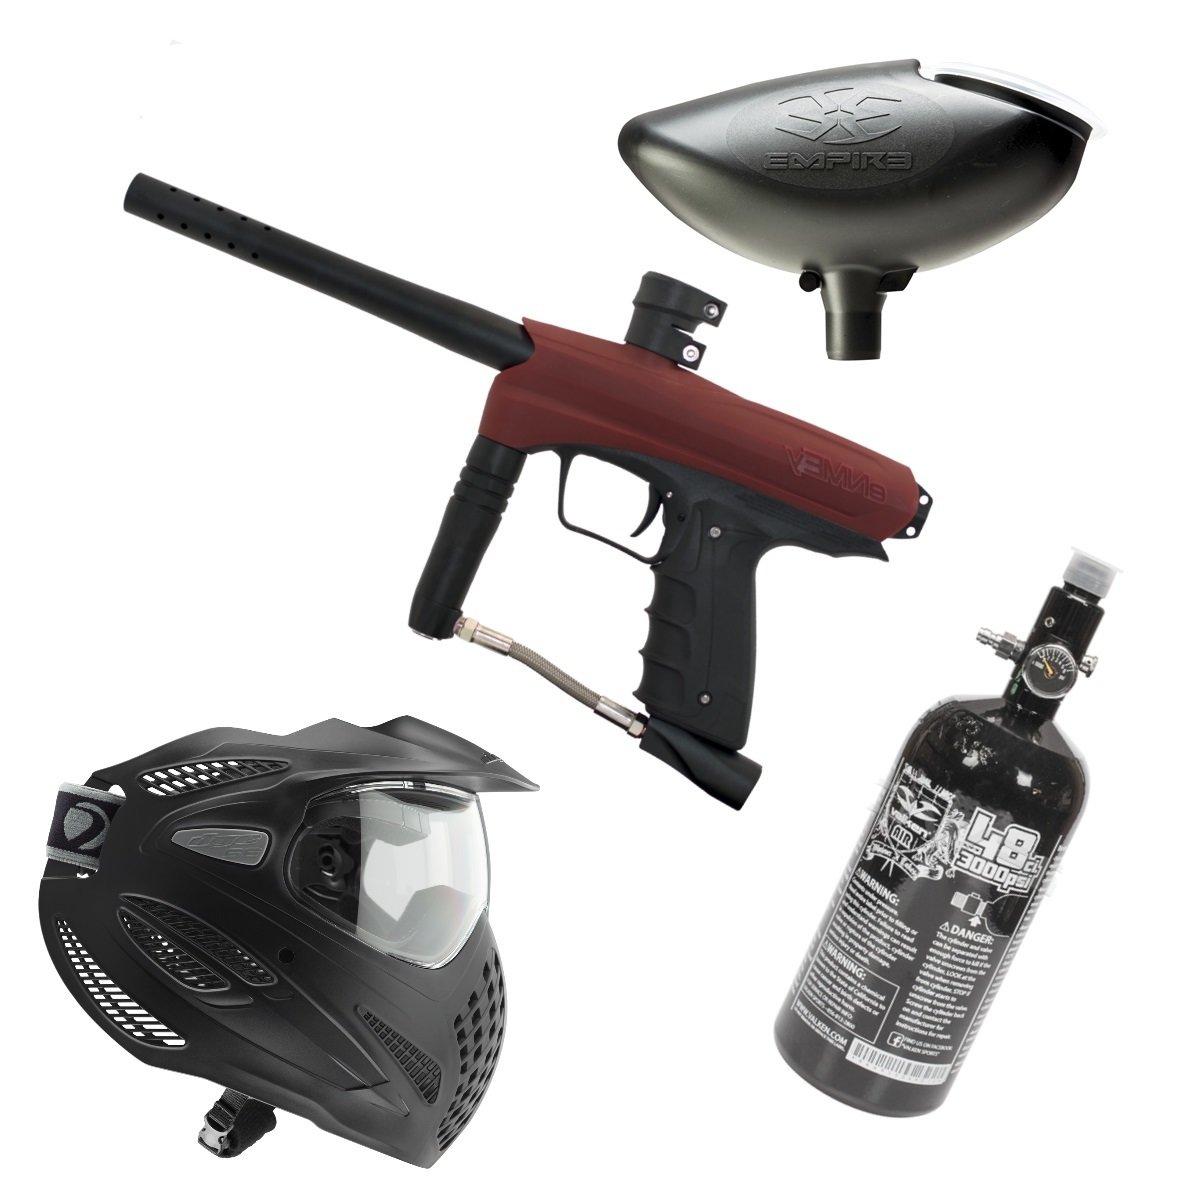 Marker Package - Gog Enmey Marker - Red / Empire 200 rd Loader / Dye Se Goggle Single / Valken 48cu 3000 psi Air Tank